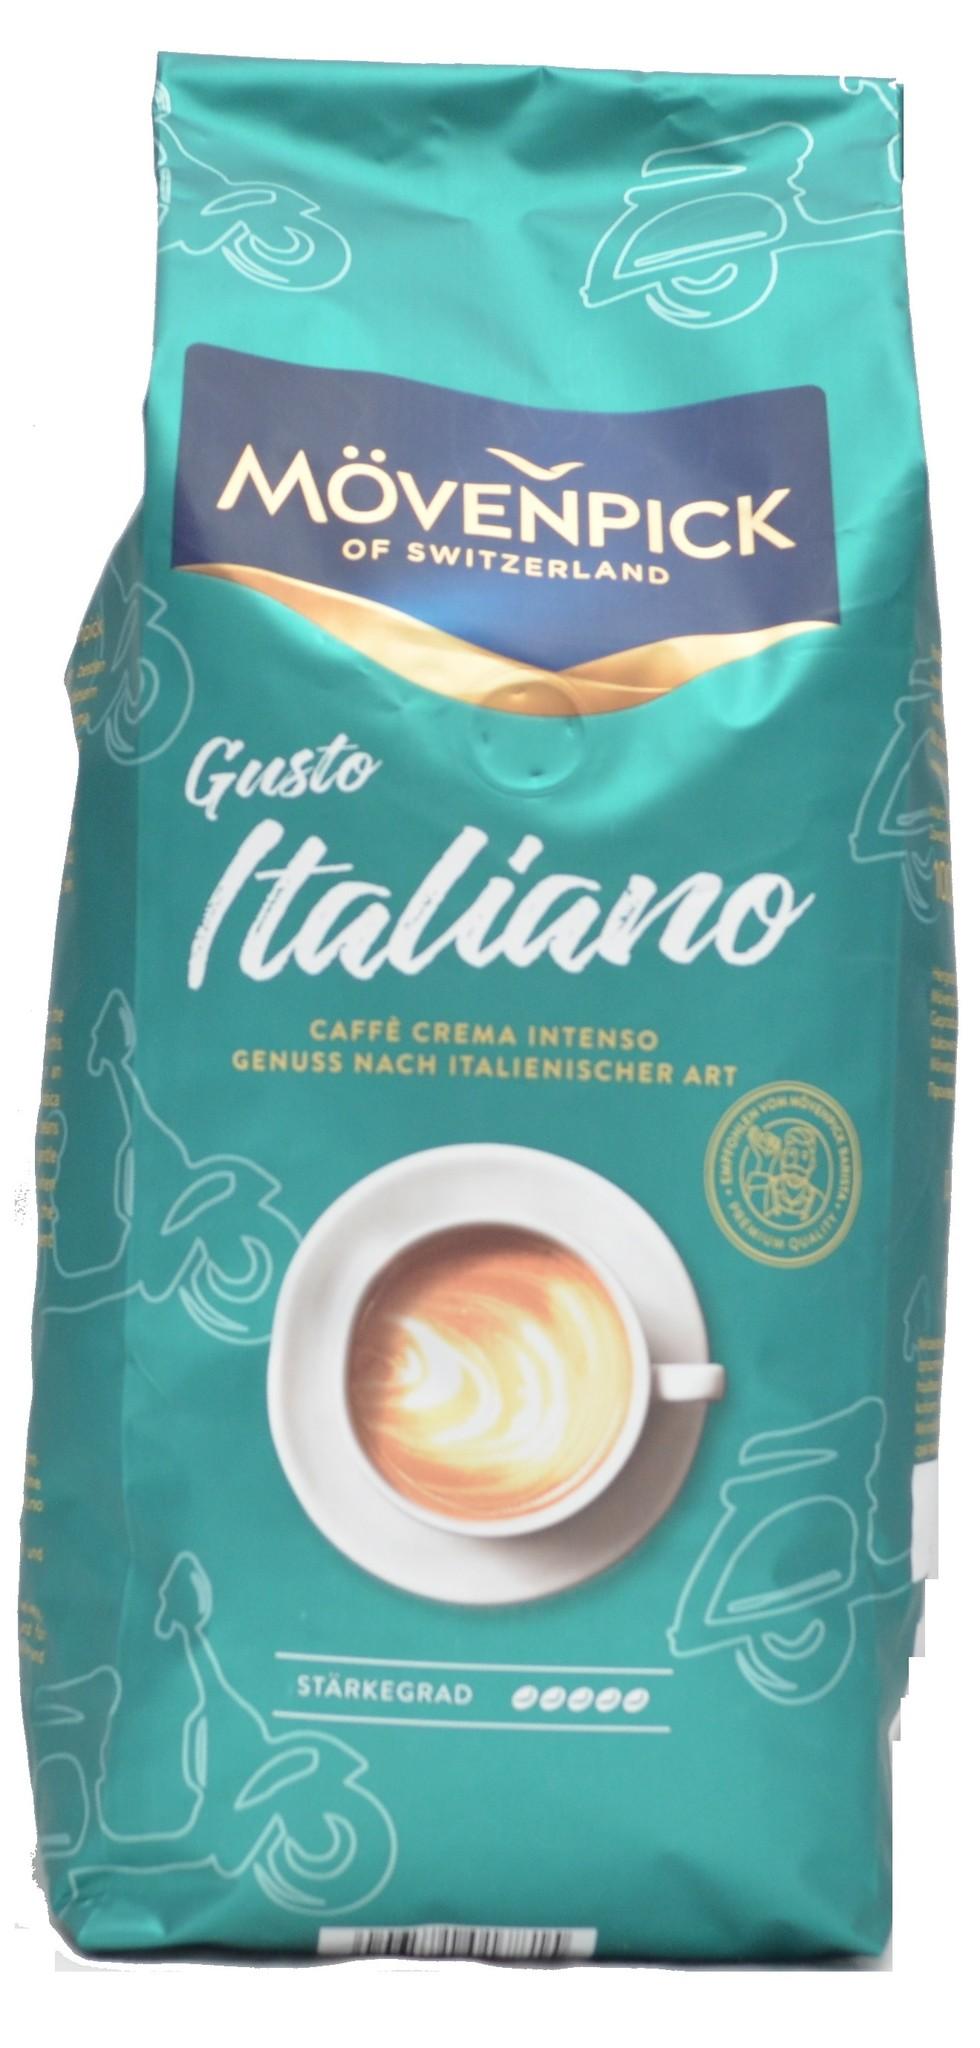 Mövenpick Caffè Crema Gusto Italiano bonen 1 kg vanaf € 7.85